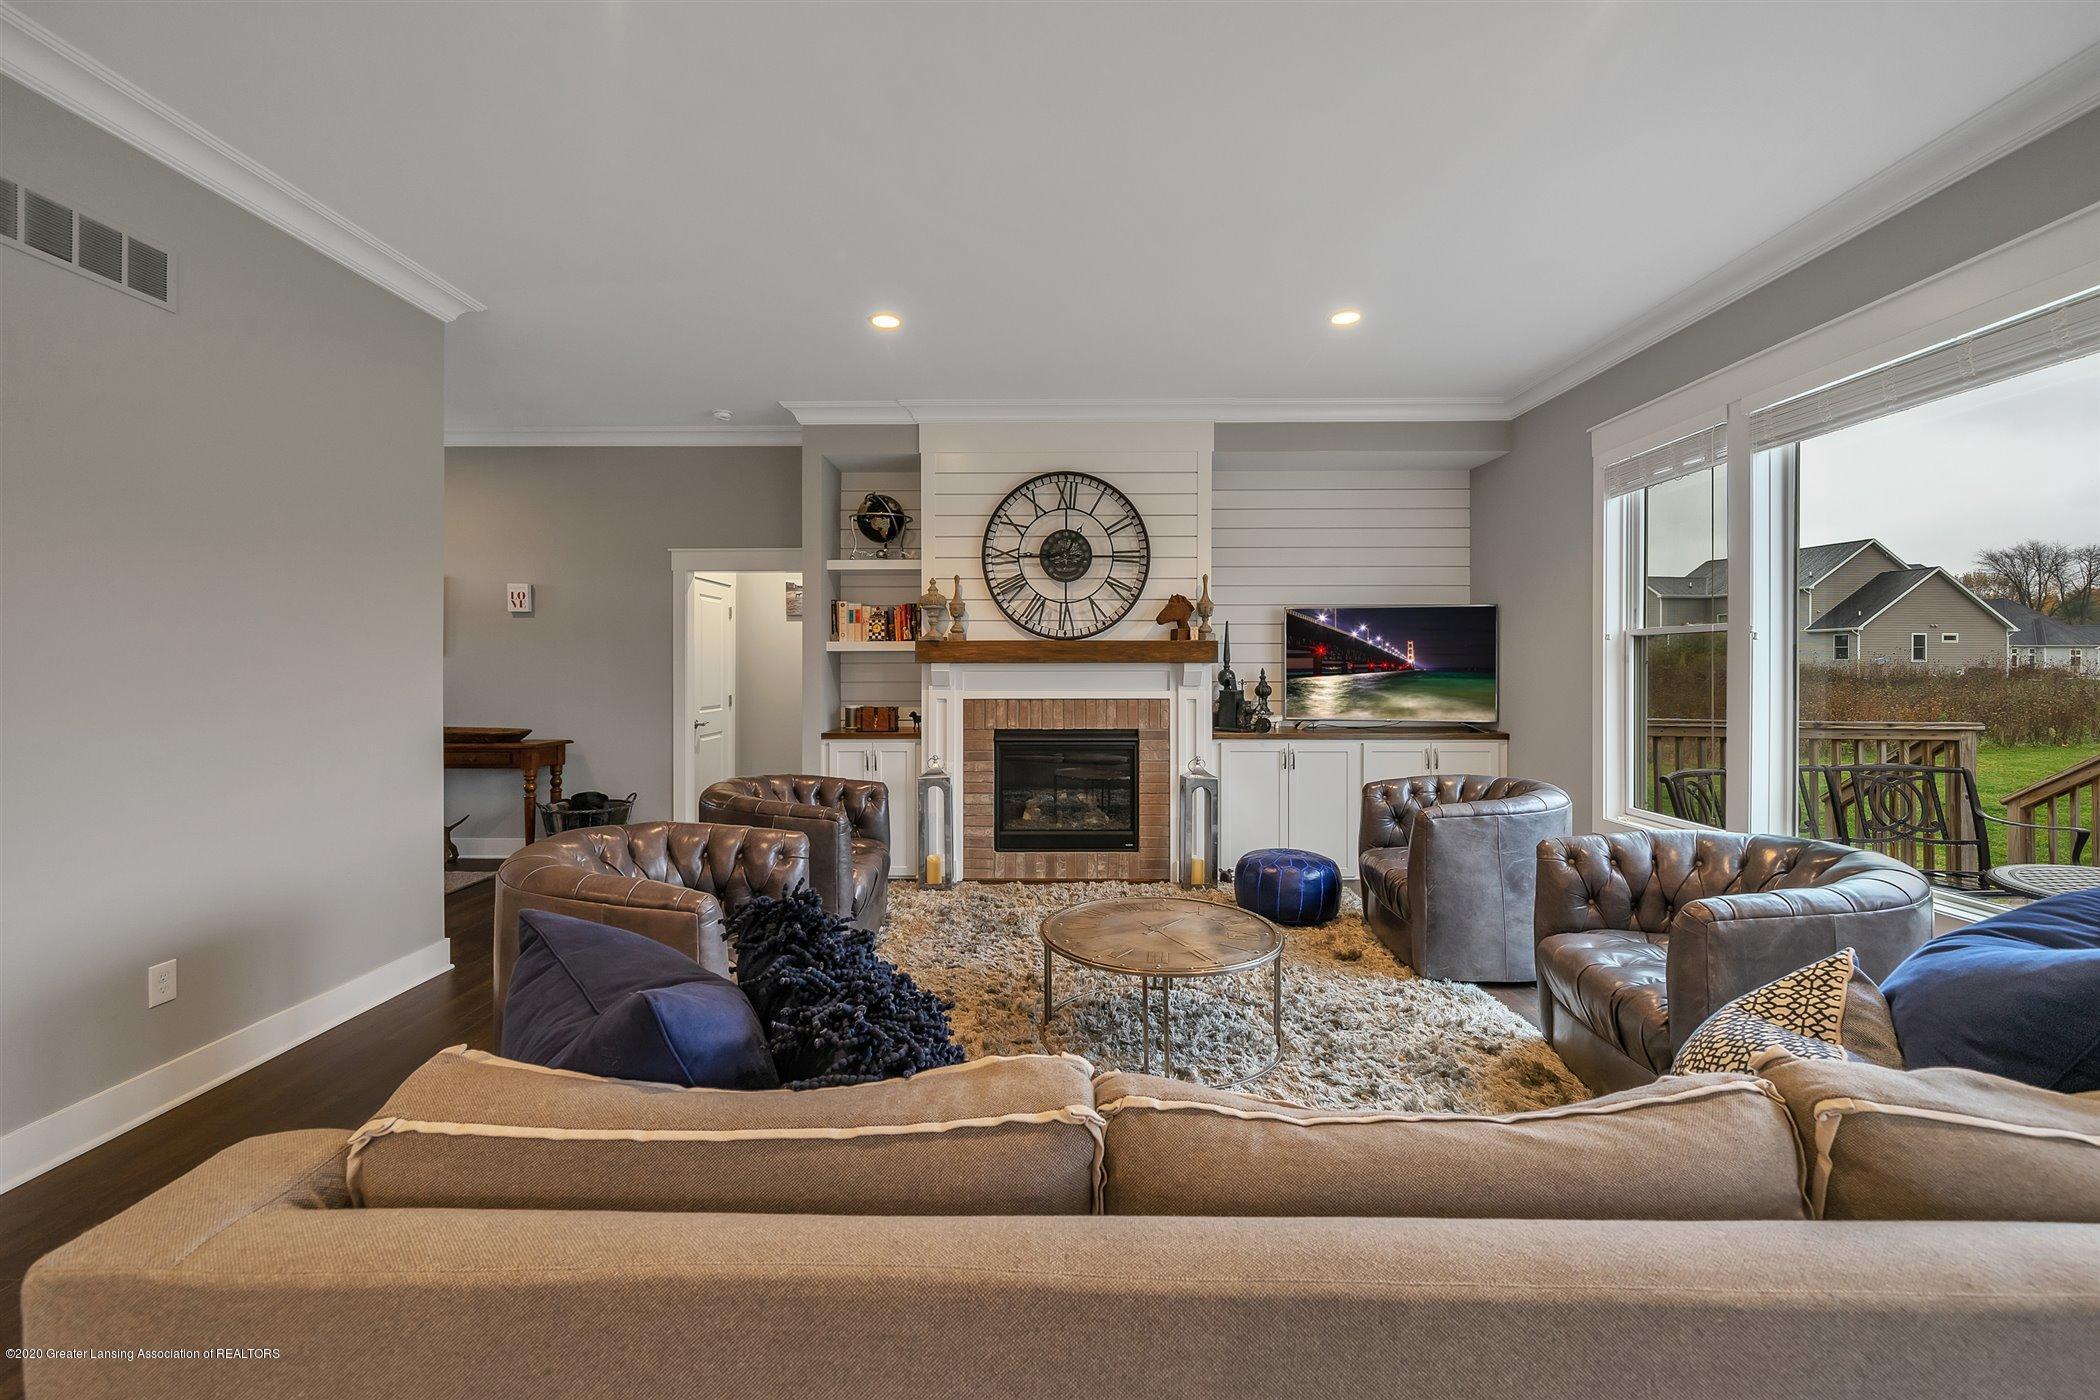 6090 Sleepy Hollow Ln - (3) MAIN FLOOR Living Room - 3